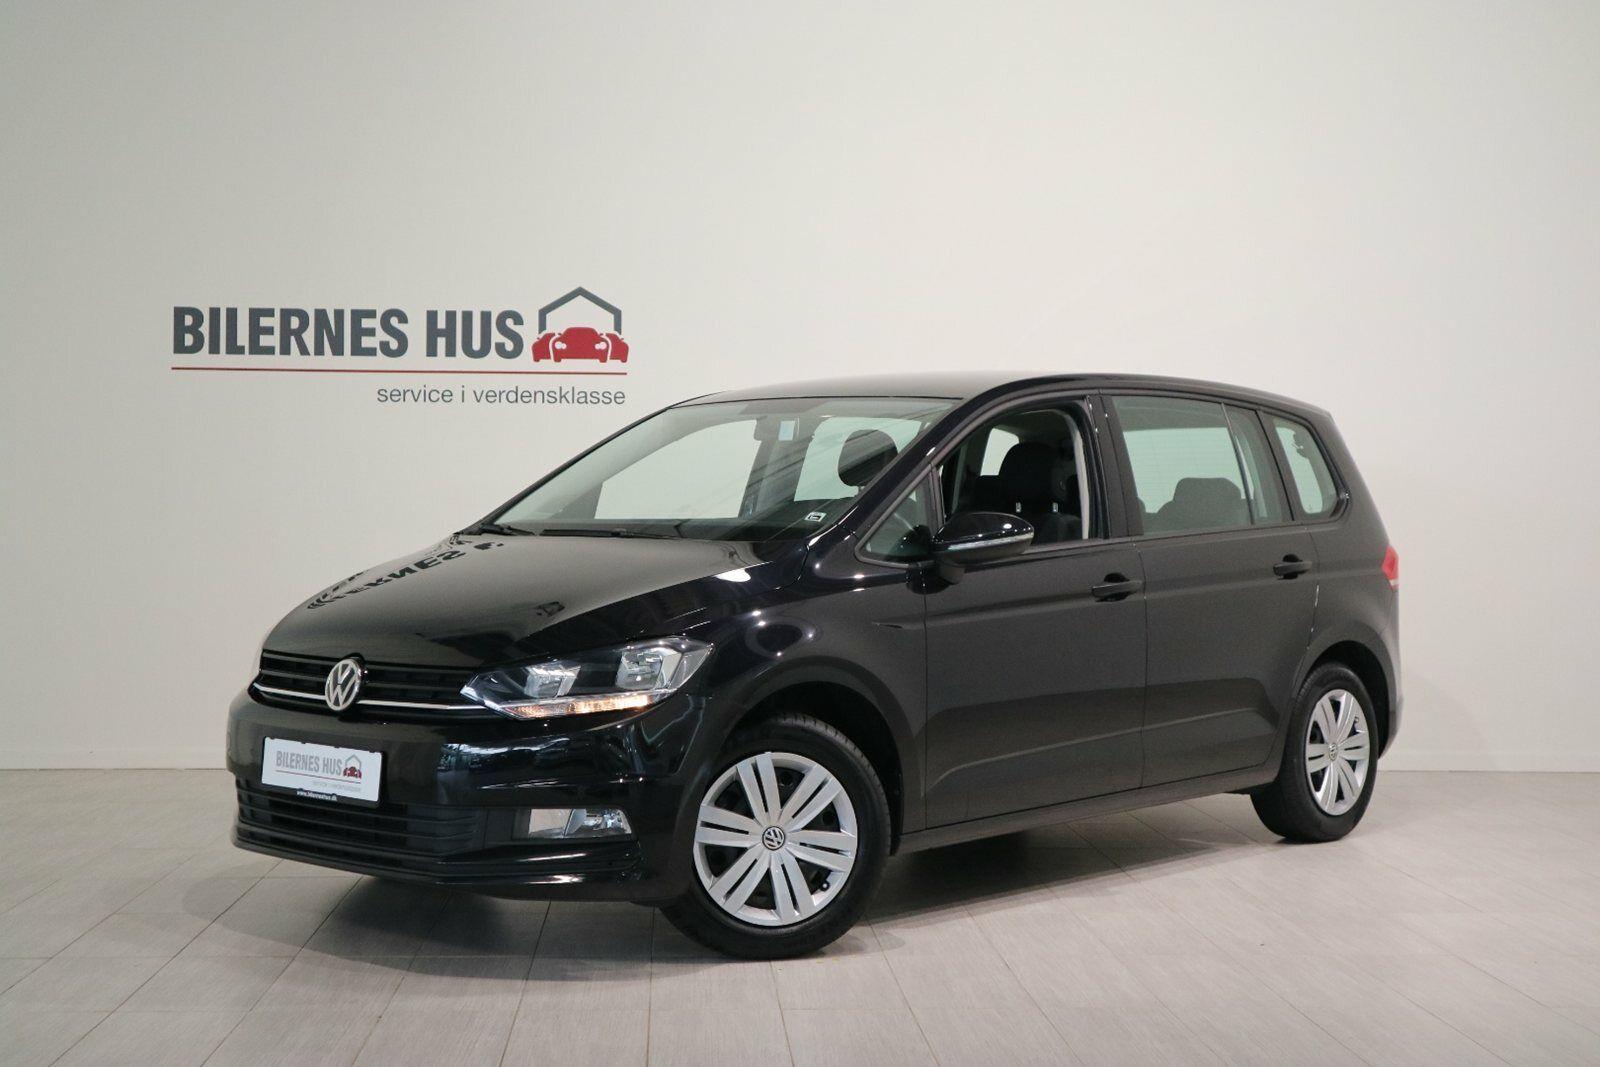 VW Touran Billede 3